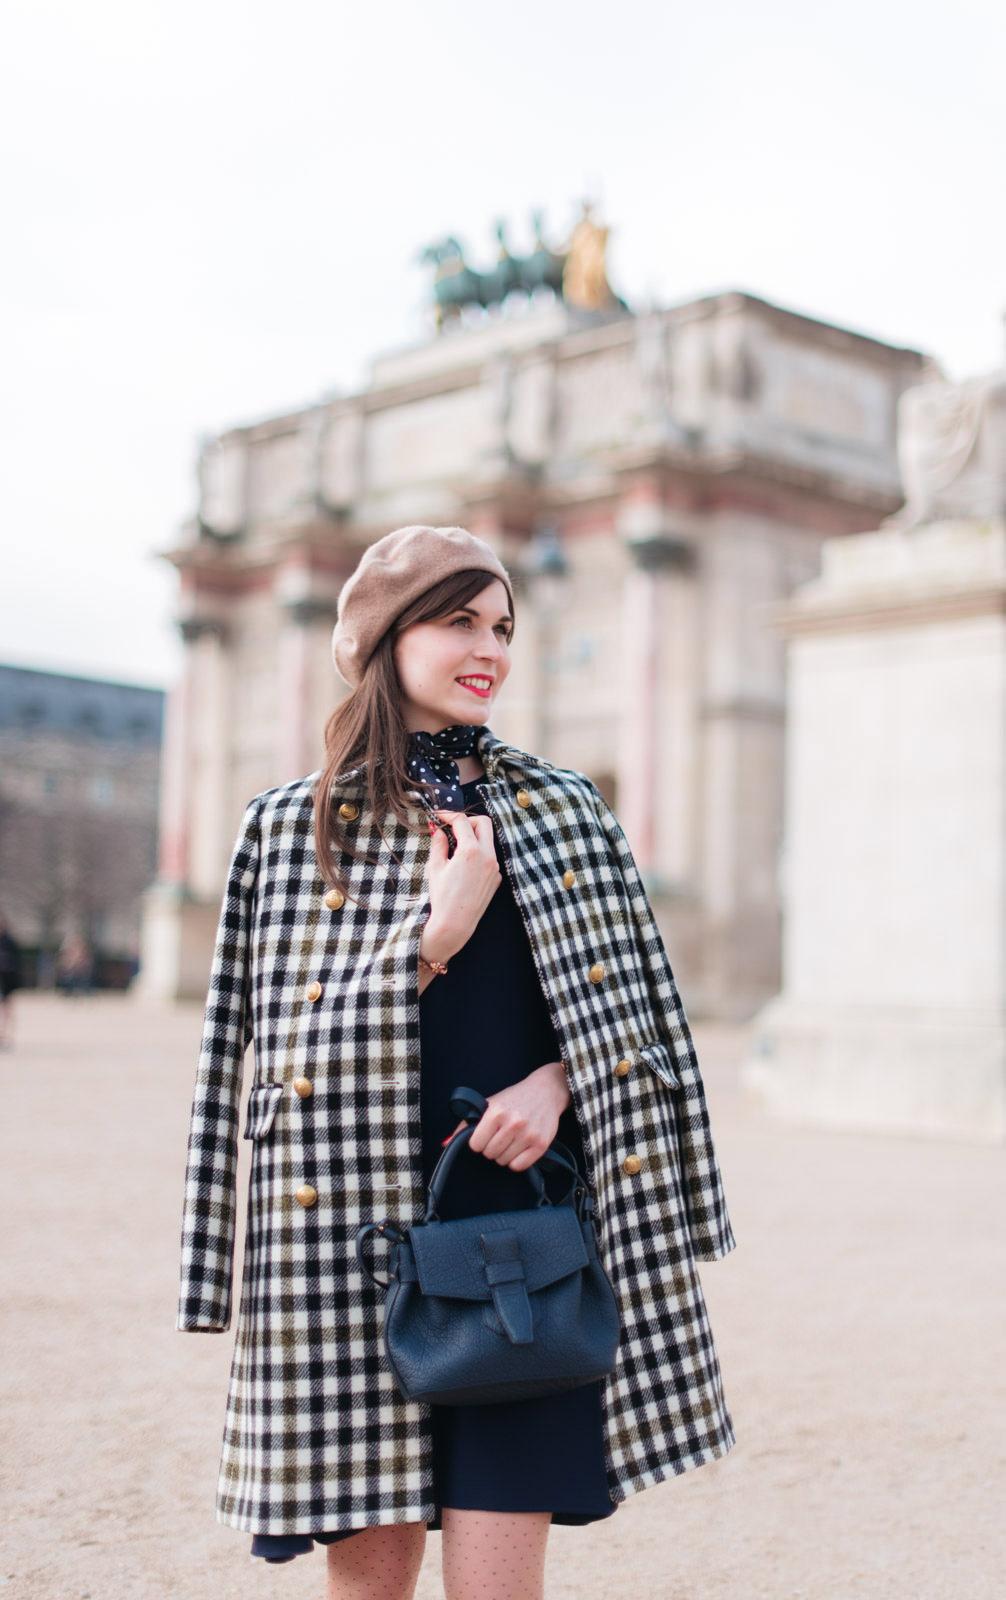 Blog-Mode-And-The-City-Looks-Manteau-Carreaux-J.Crew-3